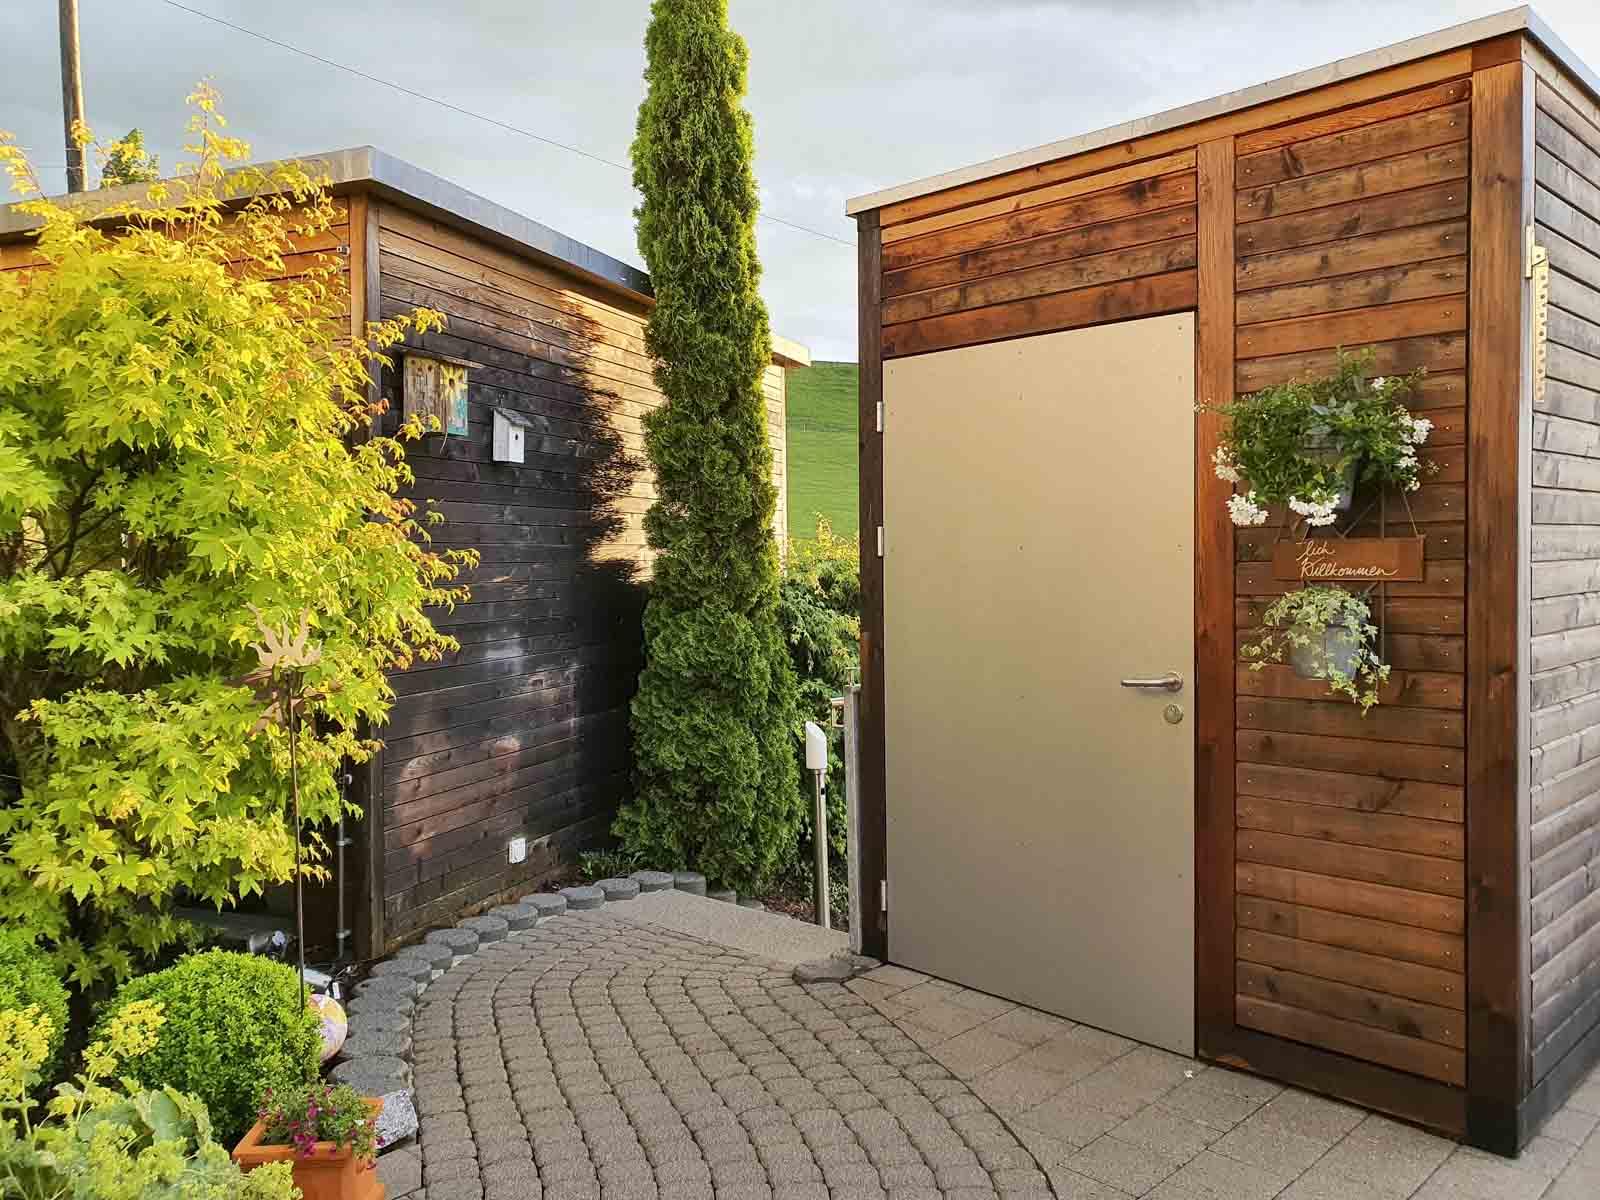 Wooddesign_Terrassengestaltung_Eingangsbereich_Pergola_Reduit_Naturholz_Lärchenholz vergraut (1)